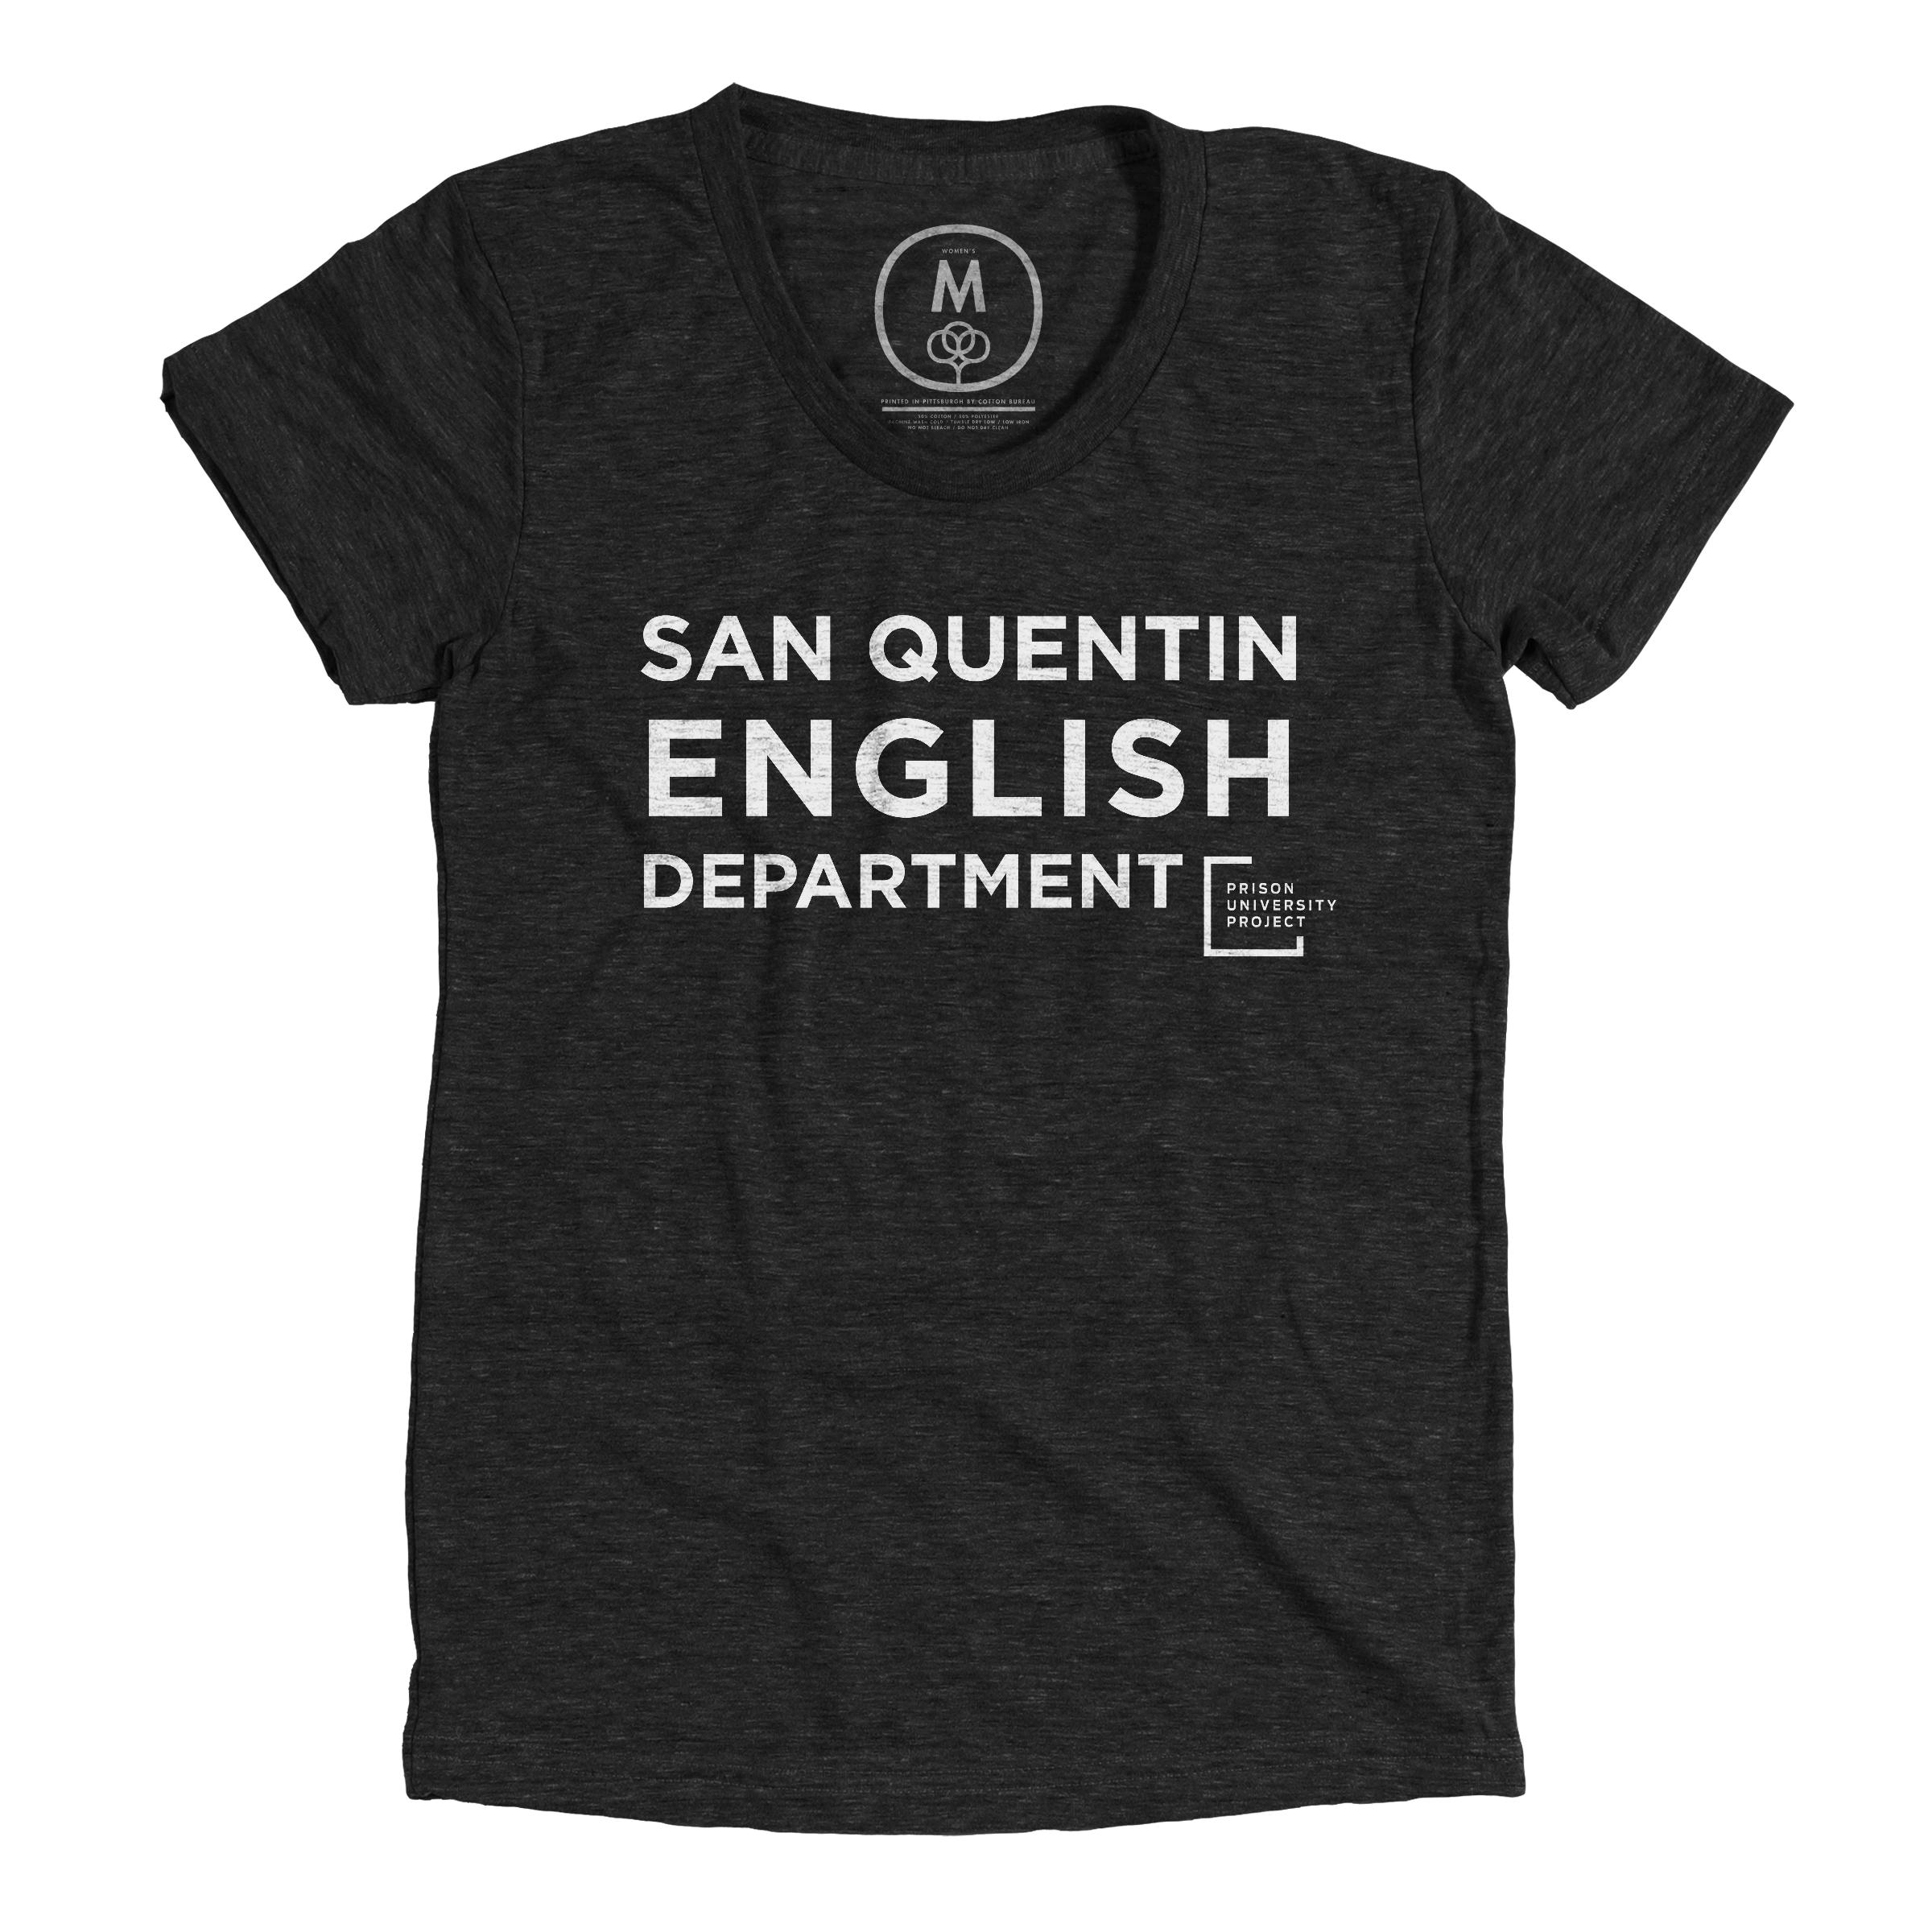 San Quentin English Department Vintage Black (Women's)